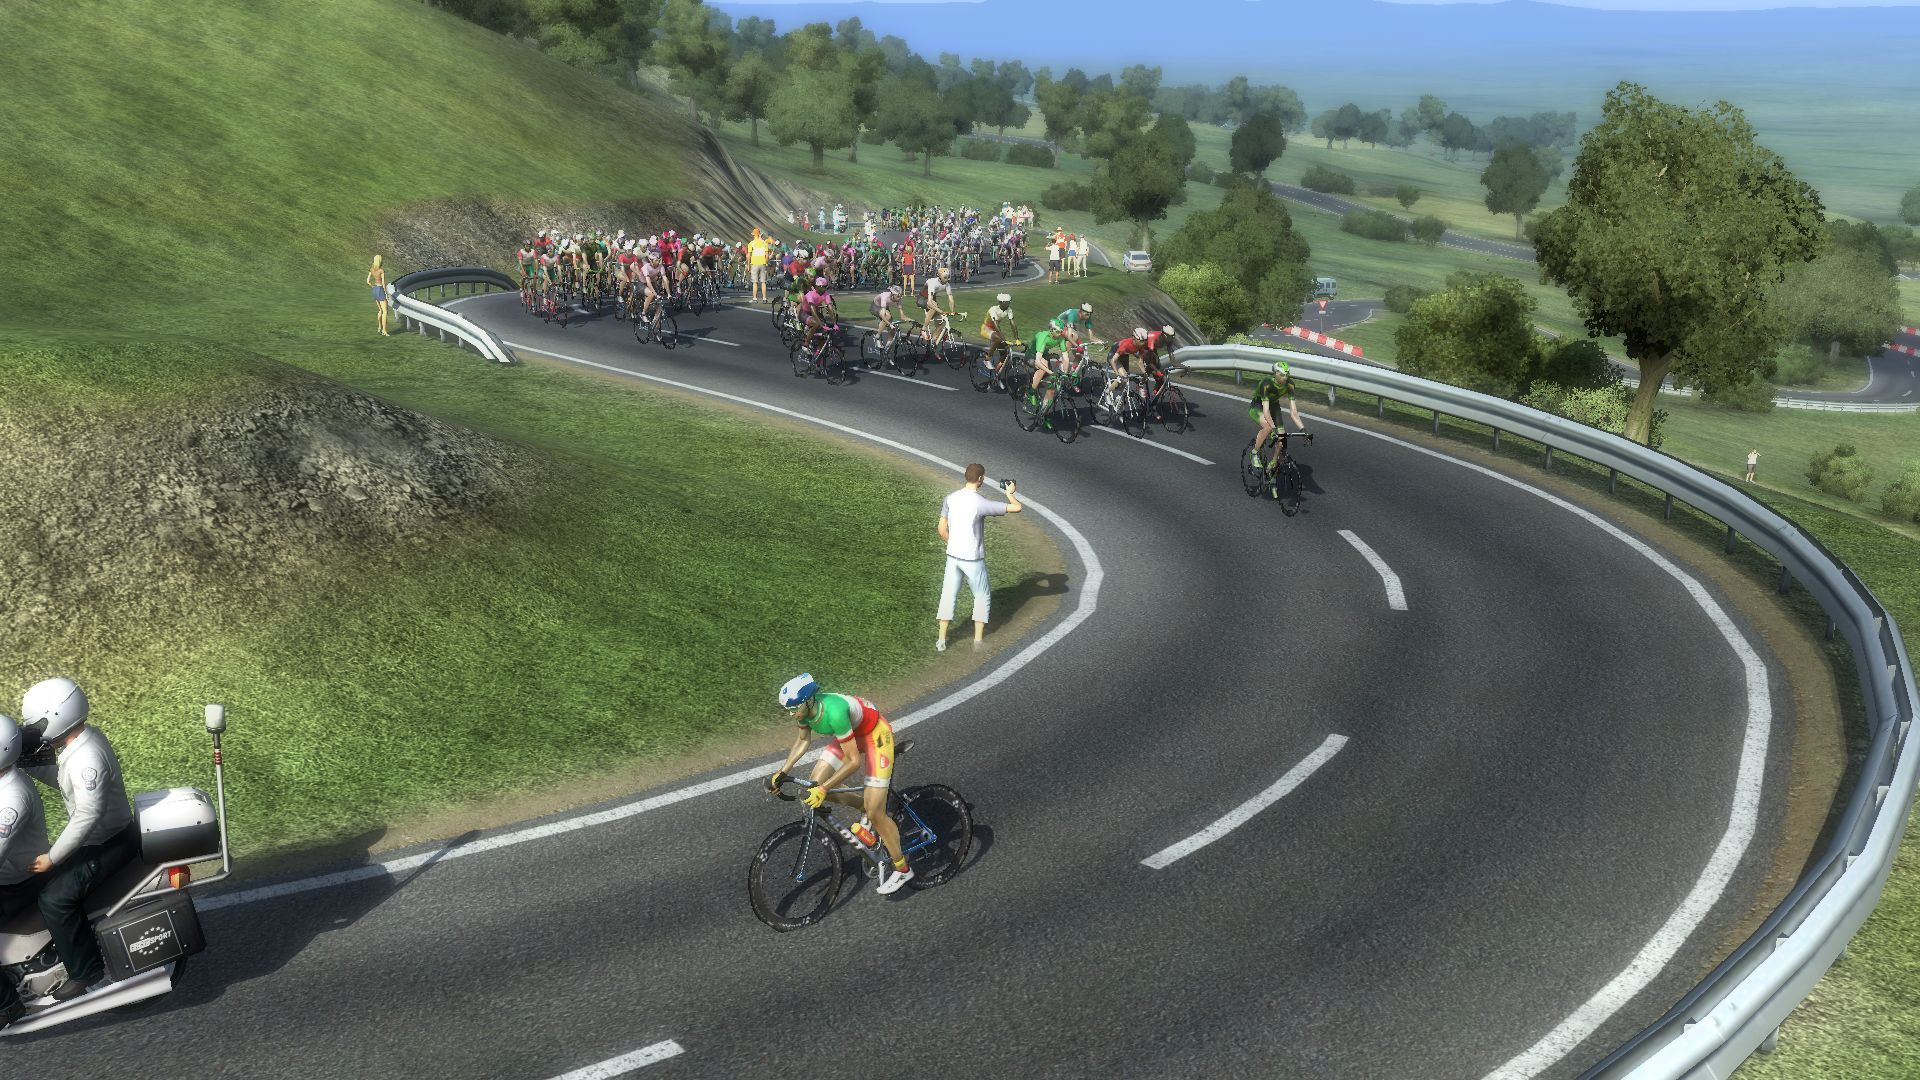 pcmdaily.com/images/mg/2018/Races/C2HC/Zuri/Zuri%2014.jpg